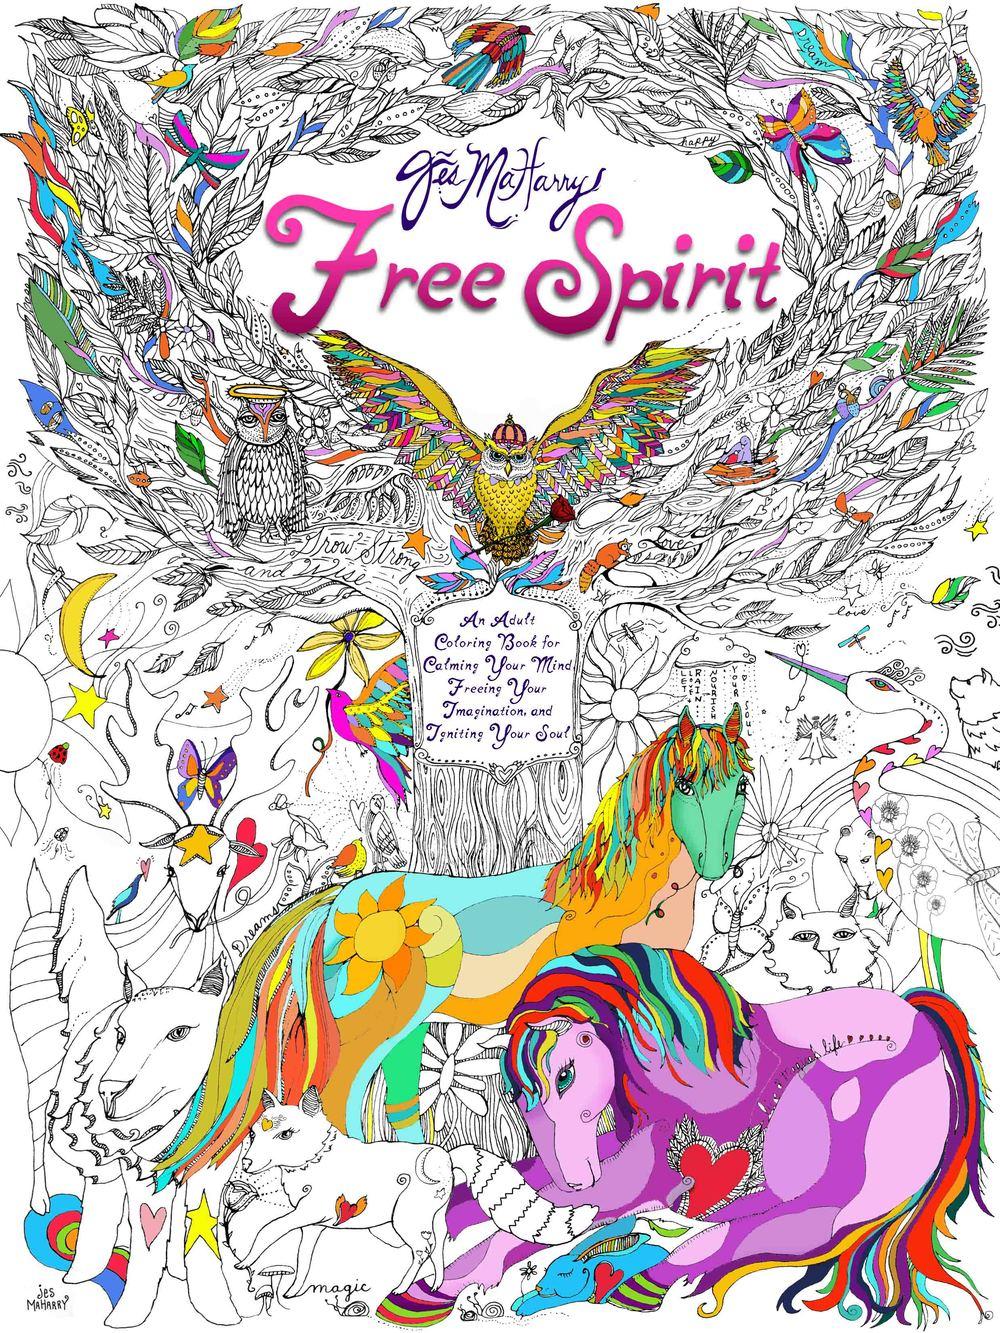 FreeSpirit_FINAL_COVER_ARTWORK_PinkType.jpg